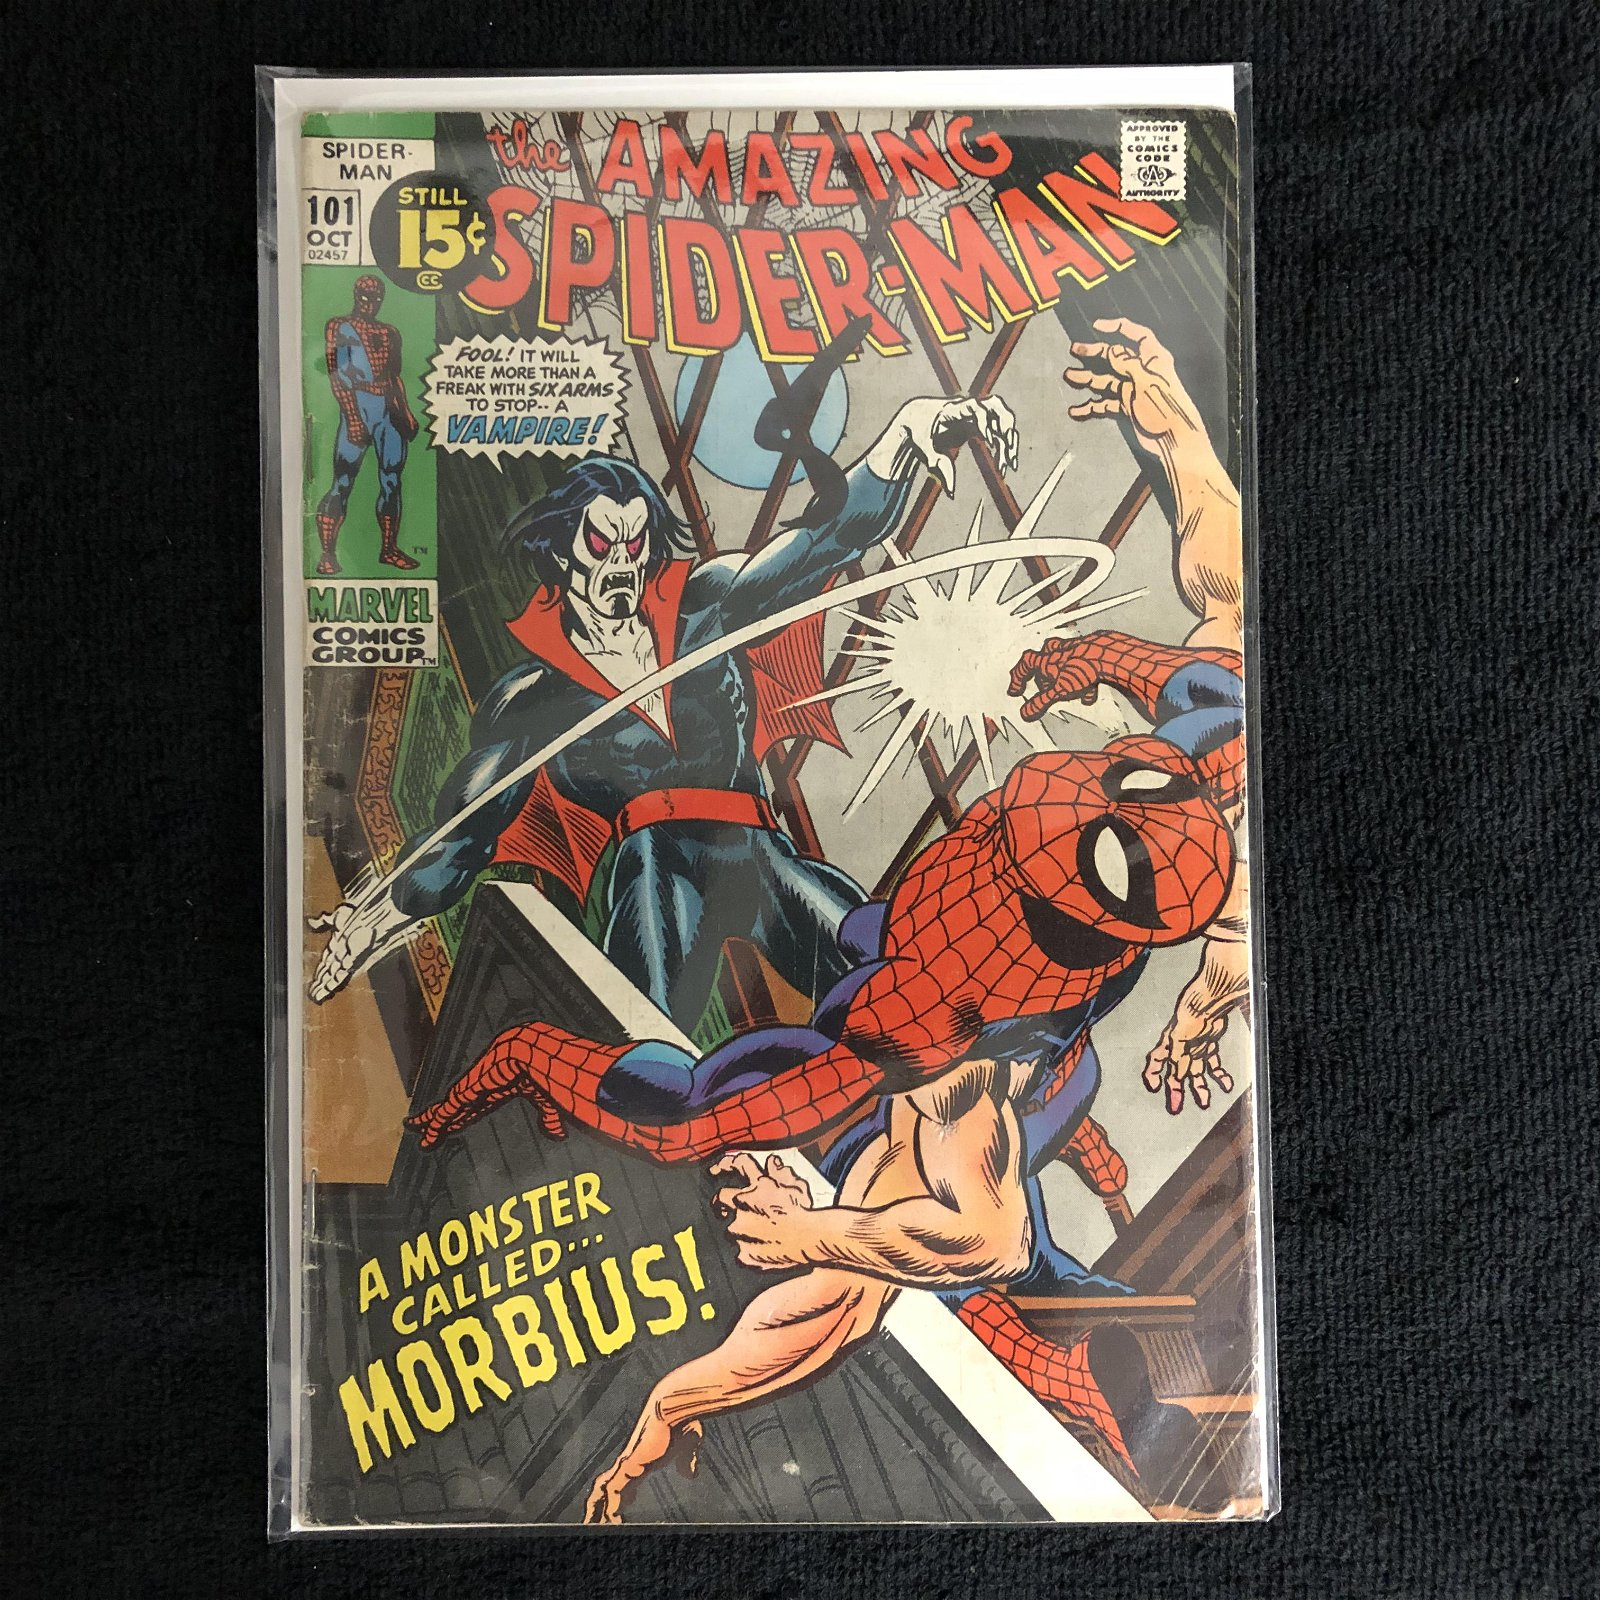 THE AMAZING SPIDER-MAN #101 (MARVEL COMICS)